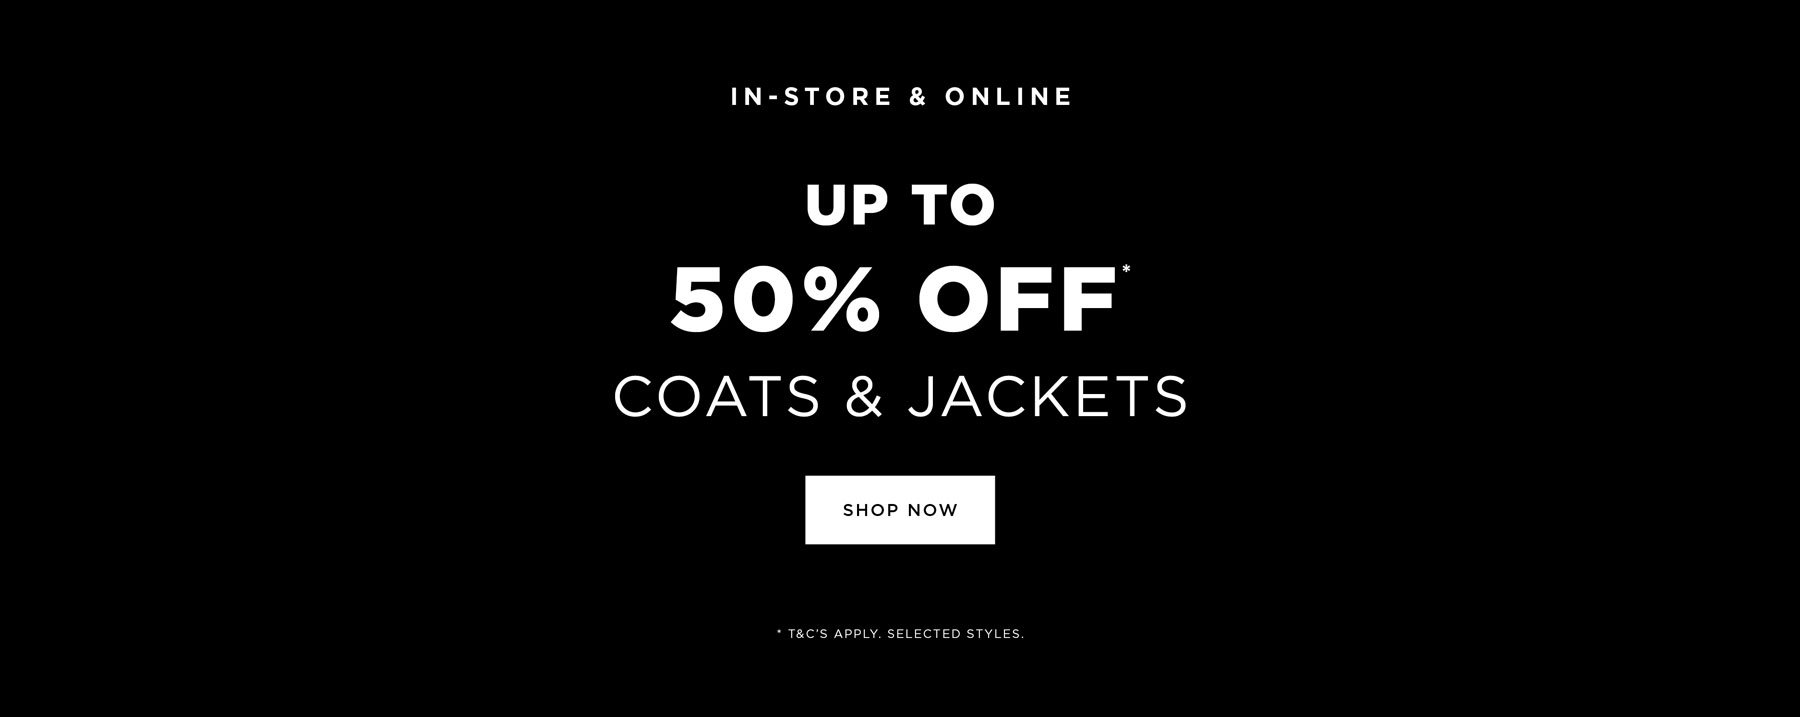 Coats offer